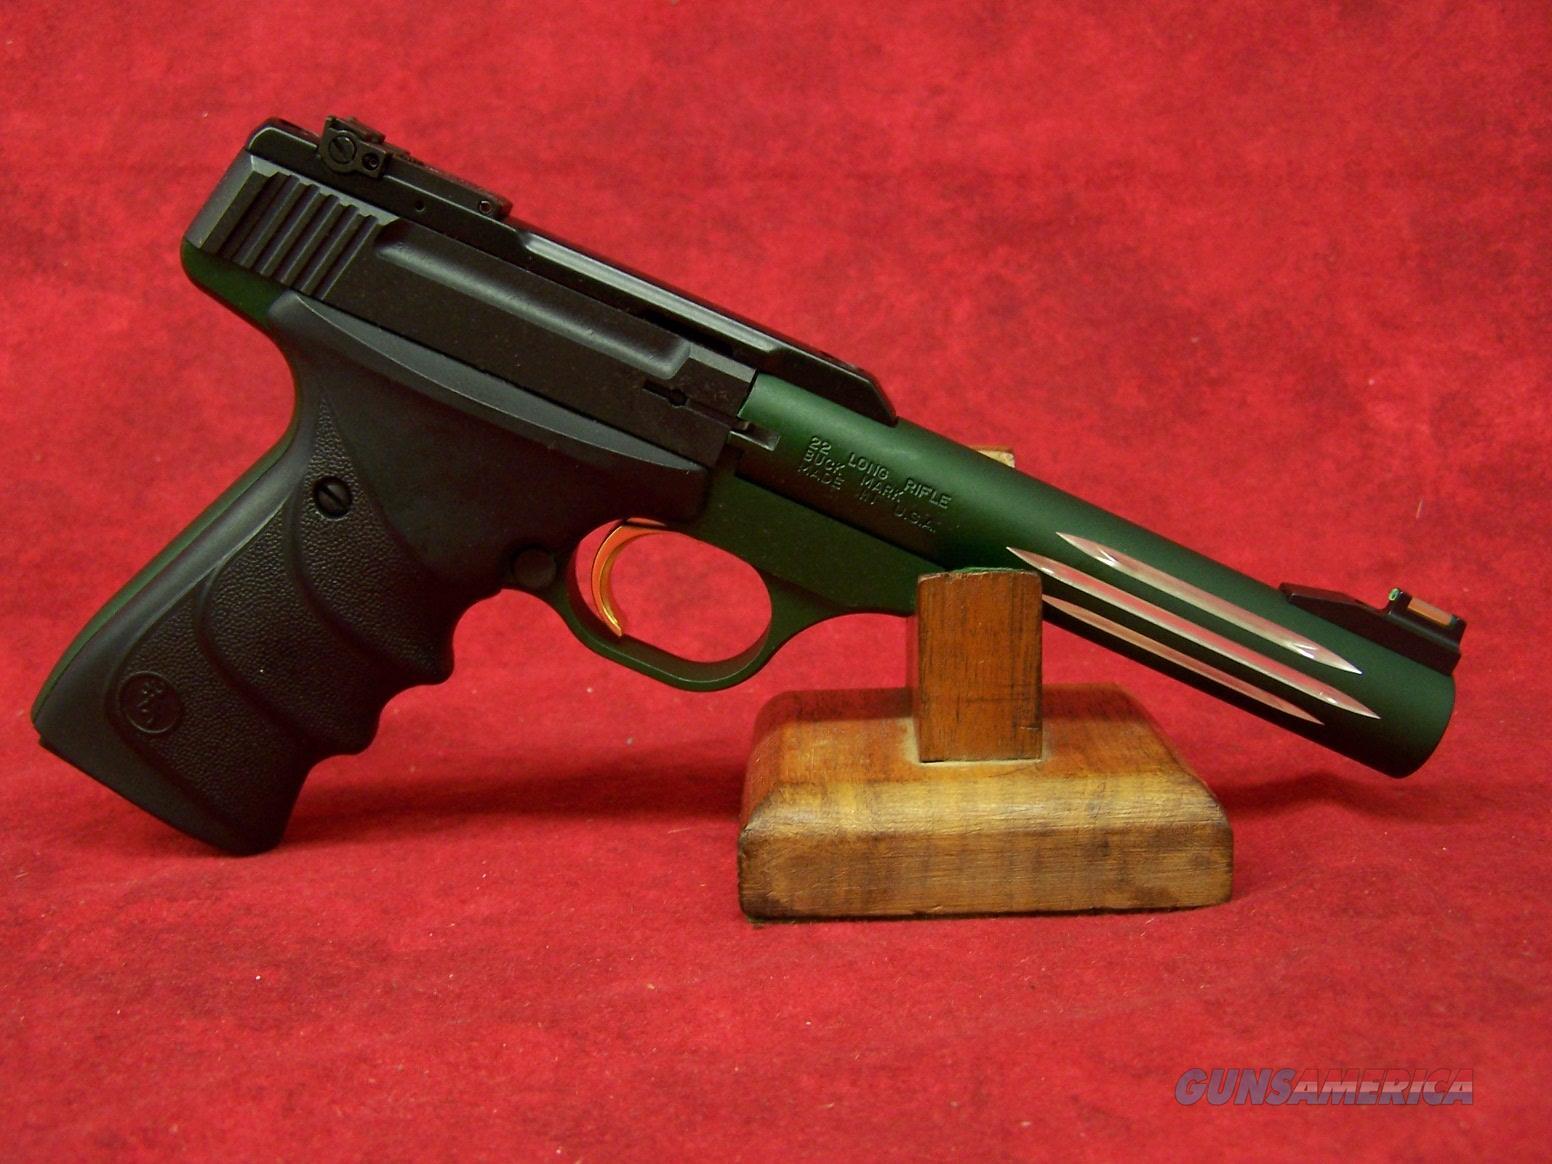 "Browning Buck Mark Lite Green URX 5 1/2"" Barrel (051516490)  Guns > Pistols > Browning Pistols > Buckmark"